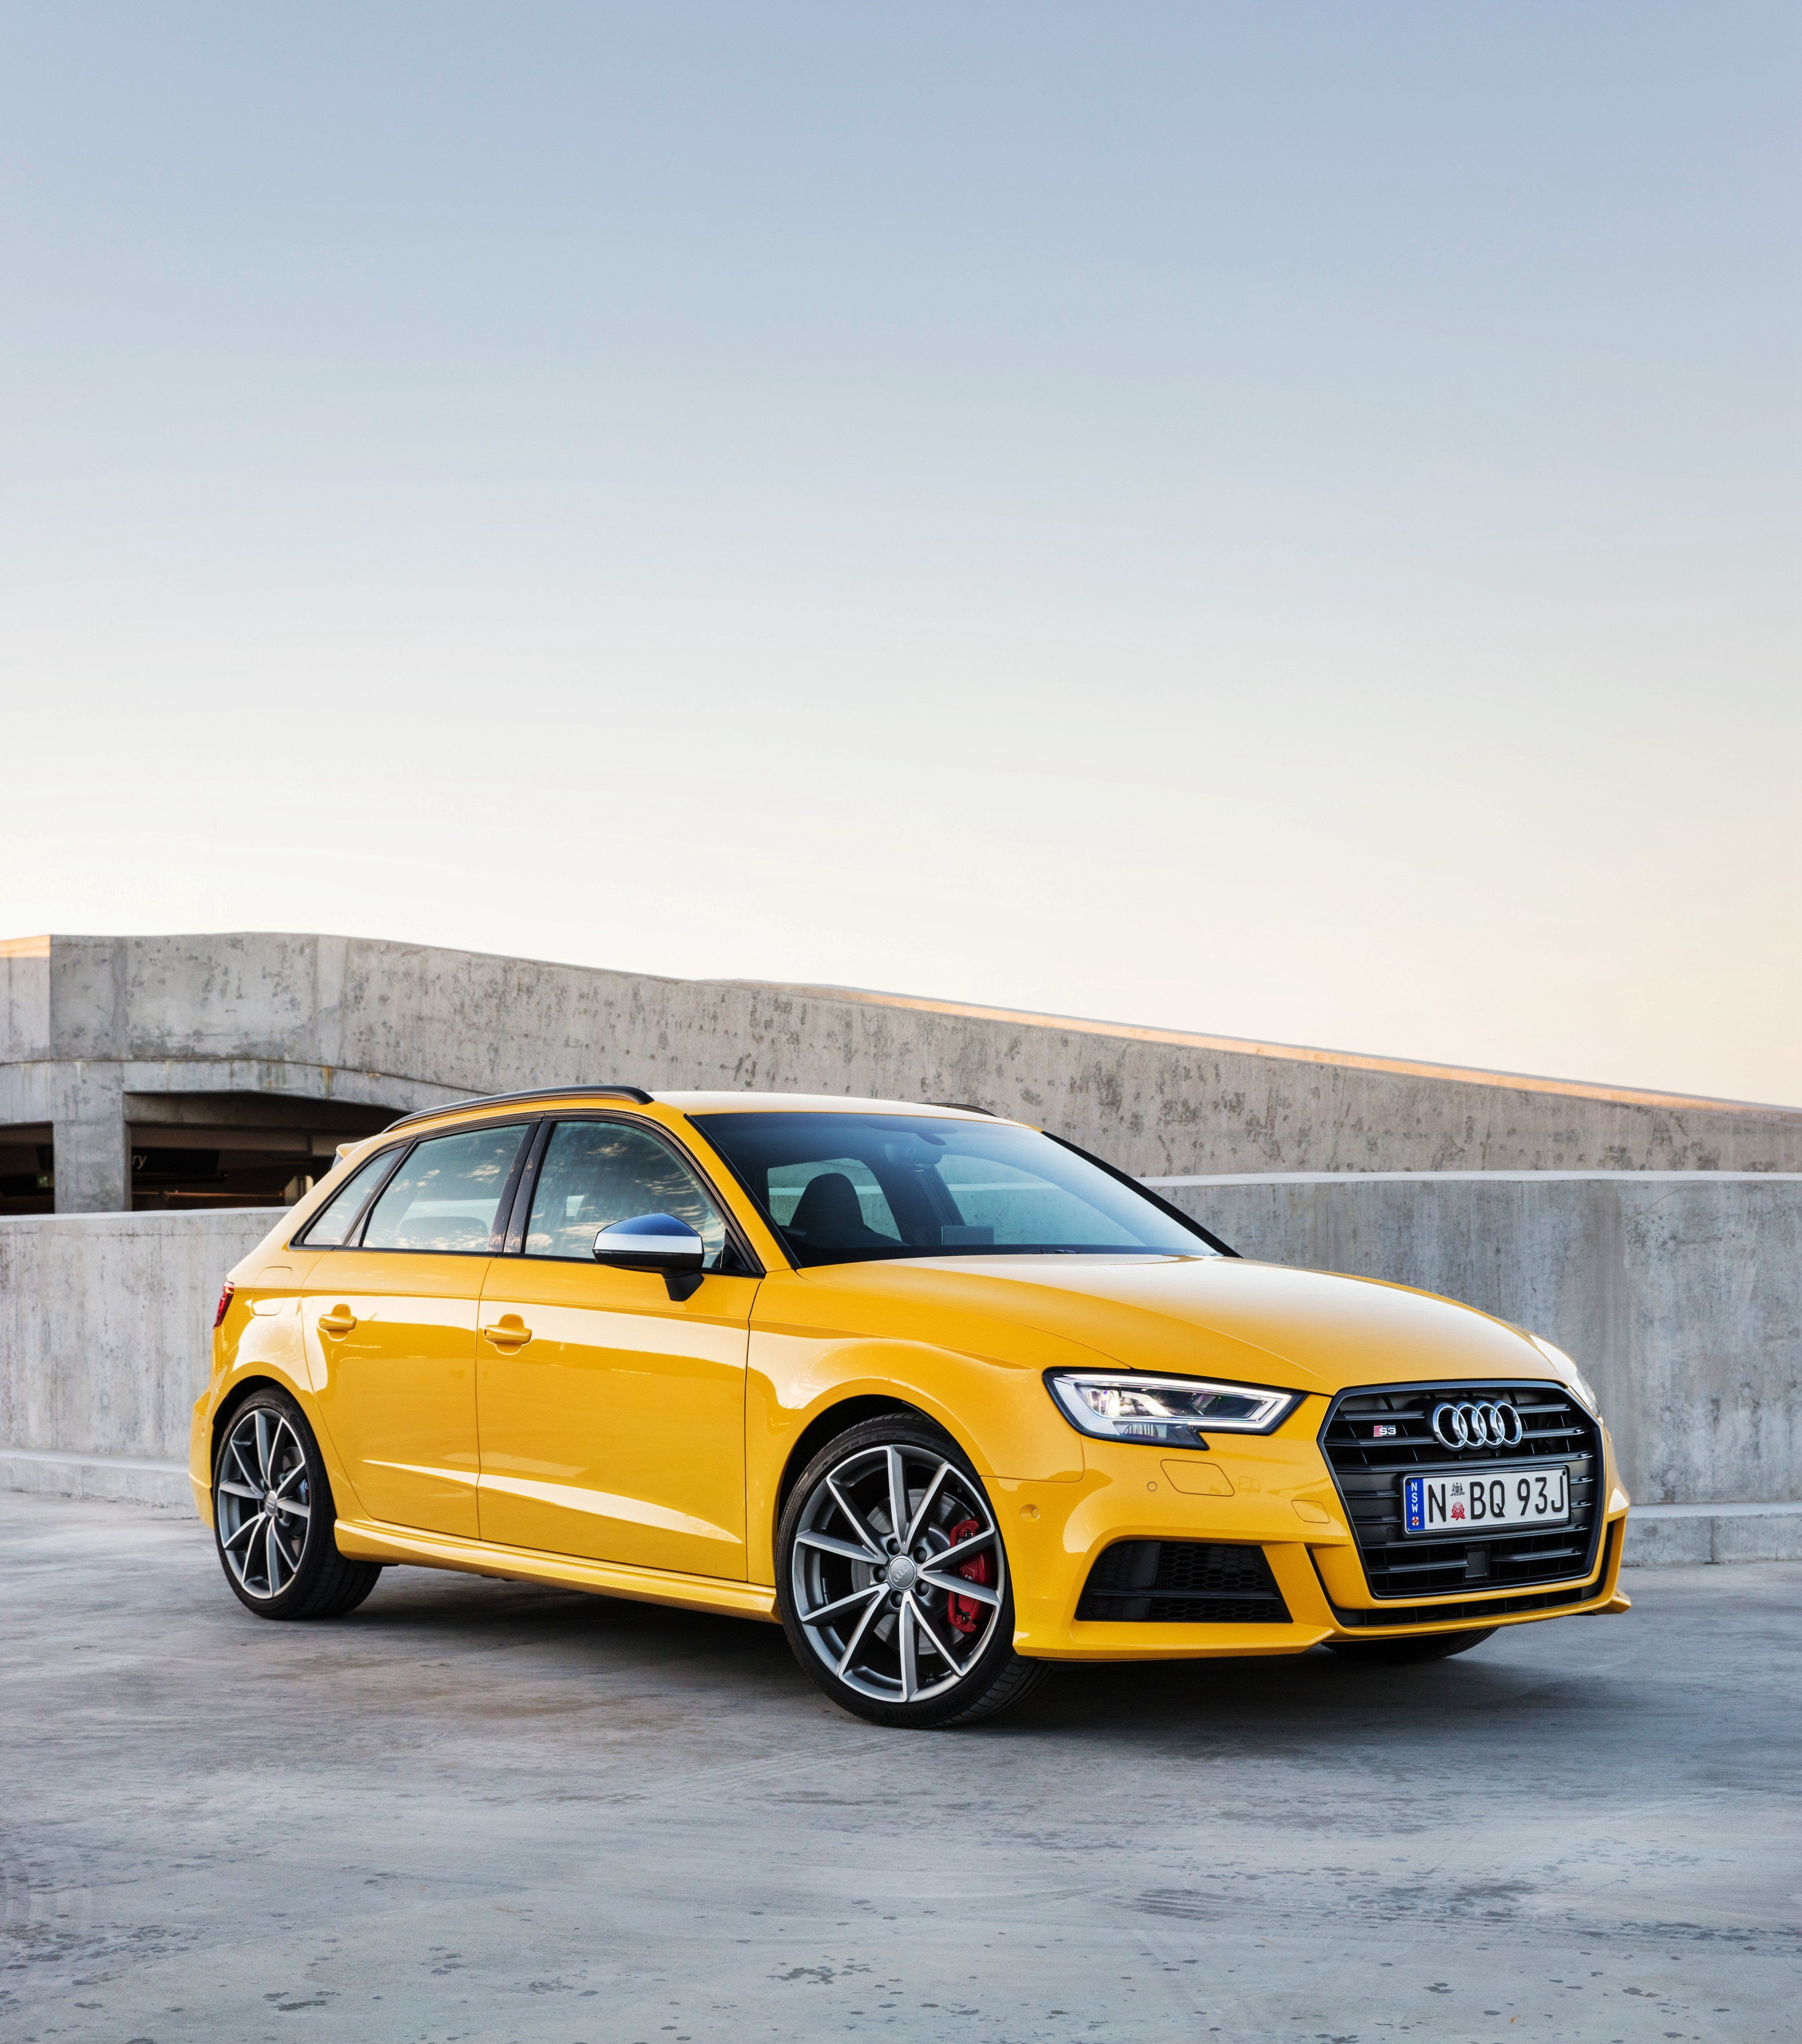 Audi S3 Sportback 2016 Audi, Audi a3 sportback, Audi rs3